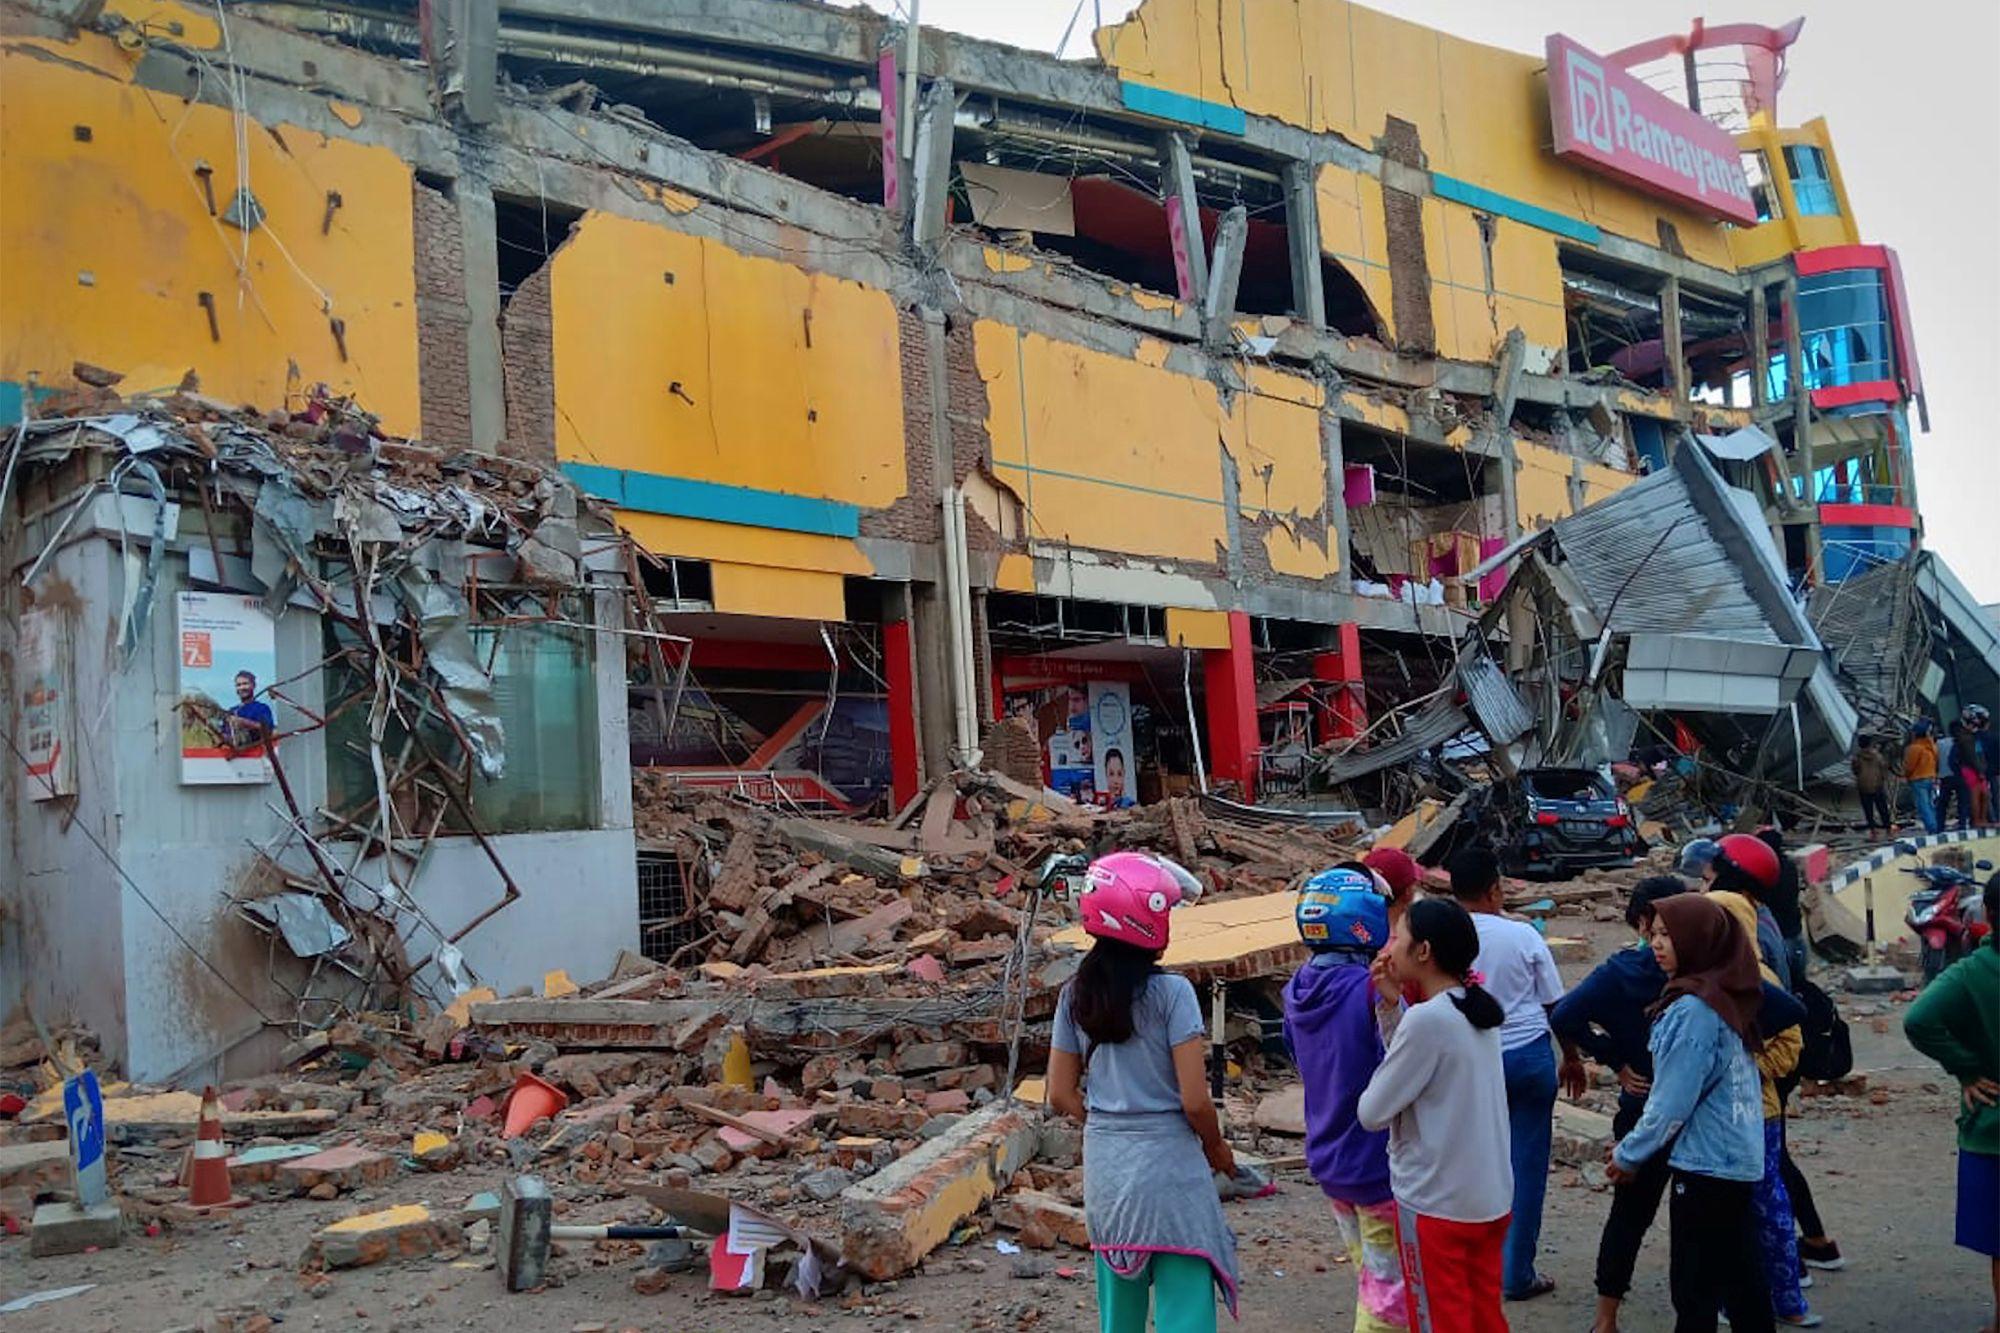 Subiu para 420 o número de vítimas mortais de tsunami na Indonésia